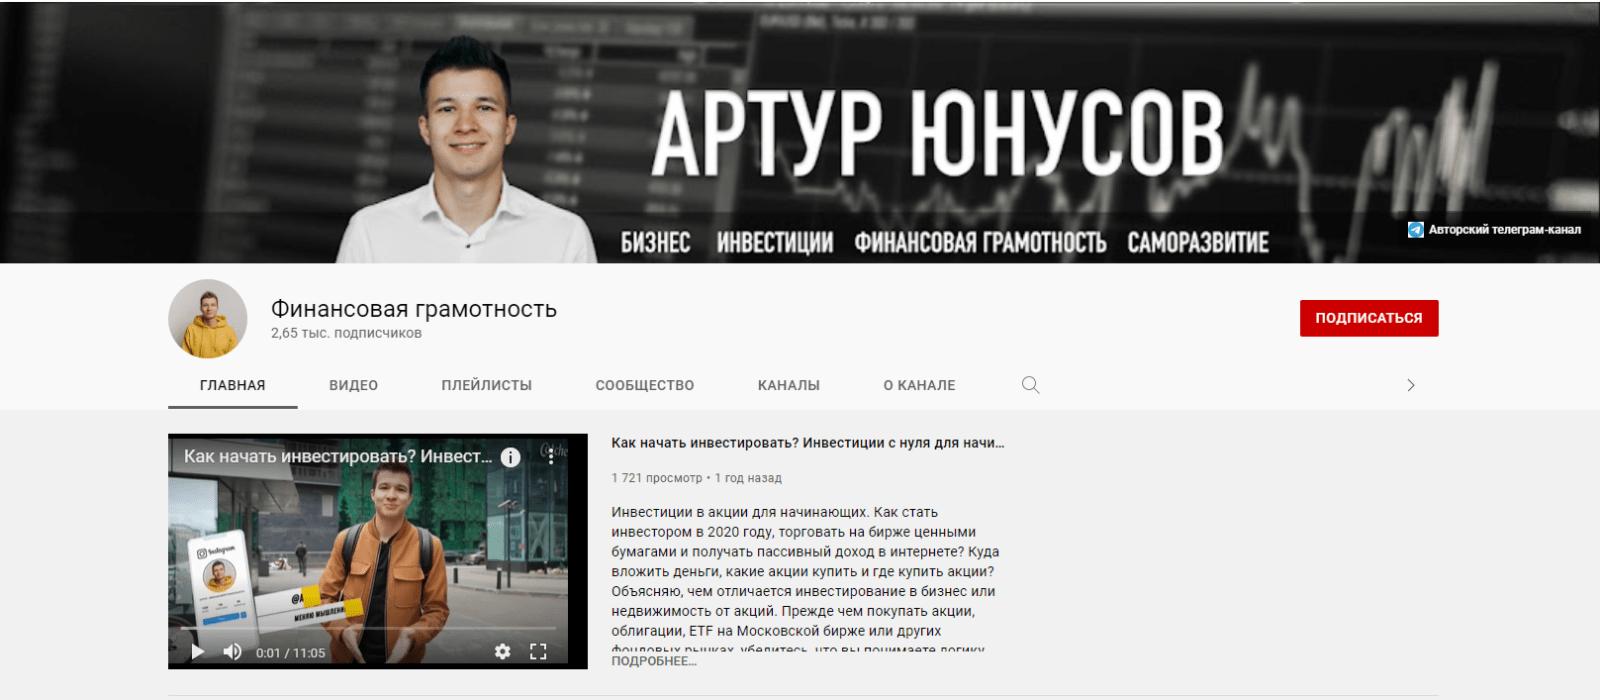 Ютуб канал трейдера Артура Юнусова